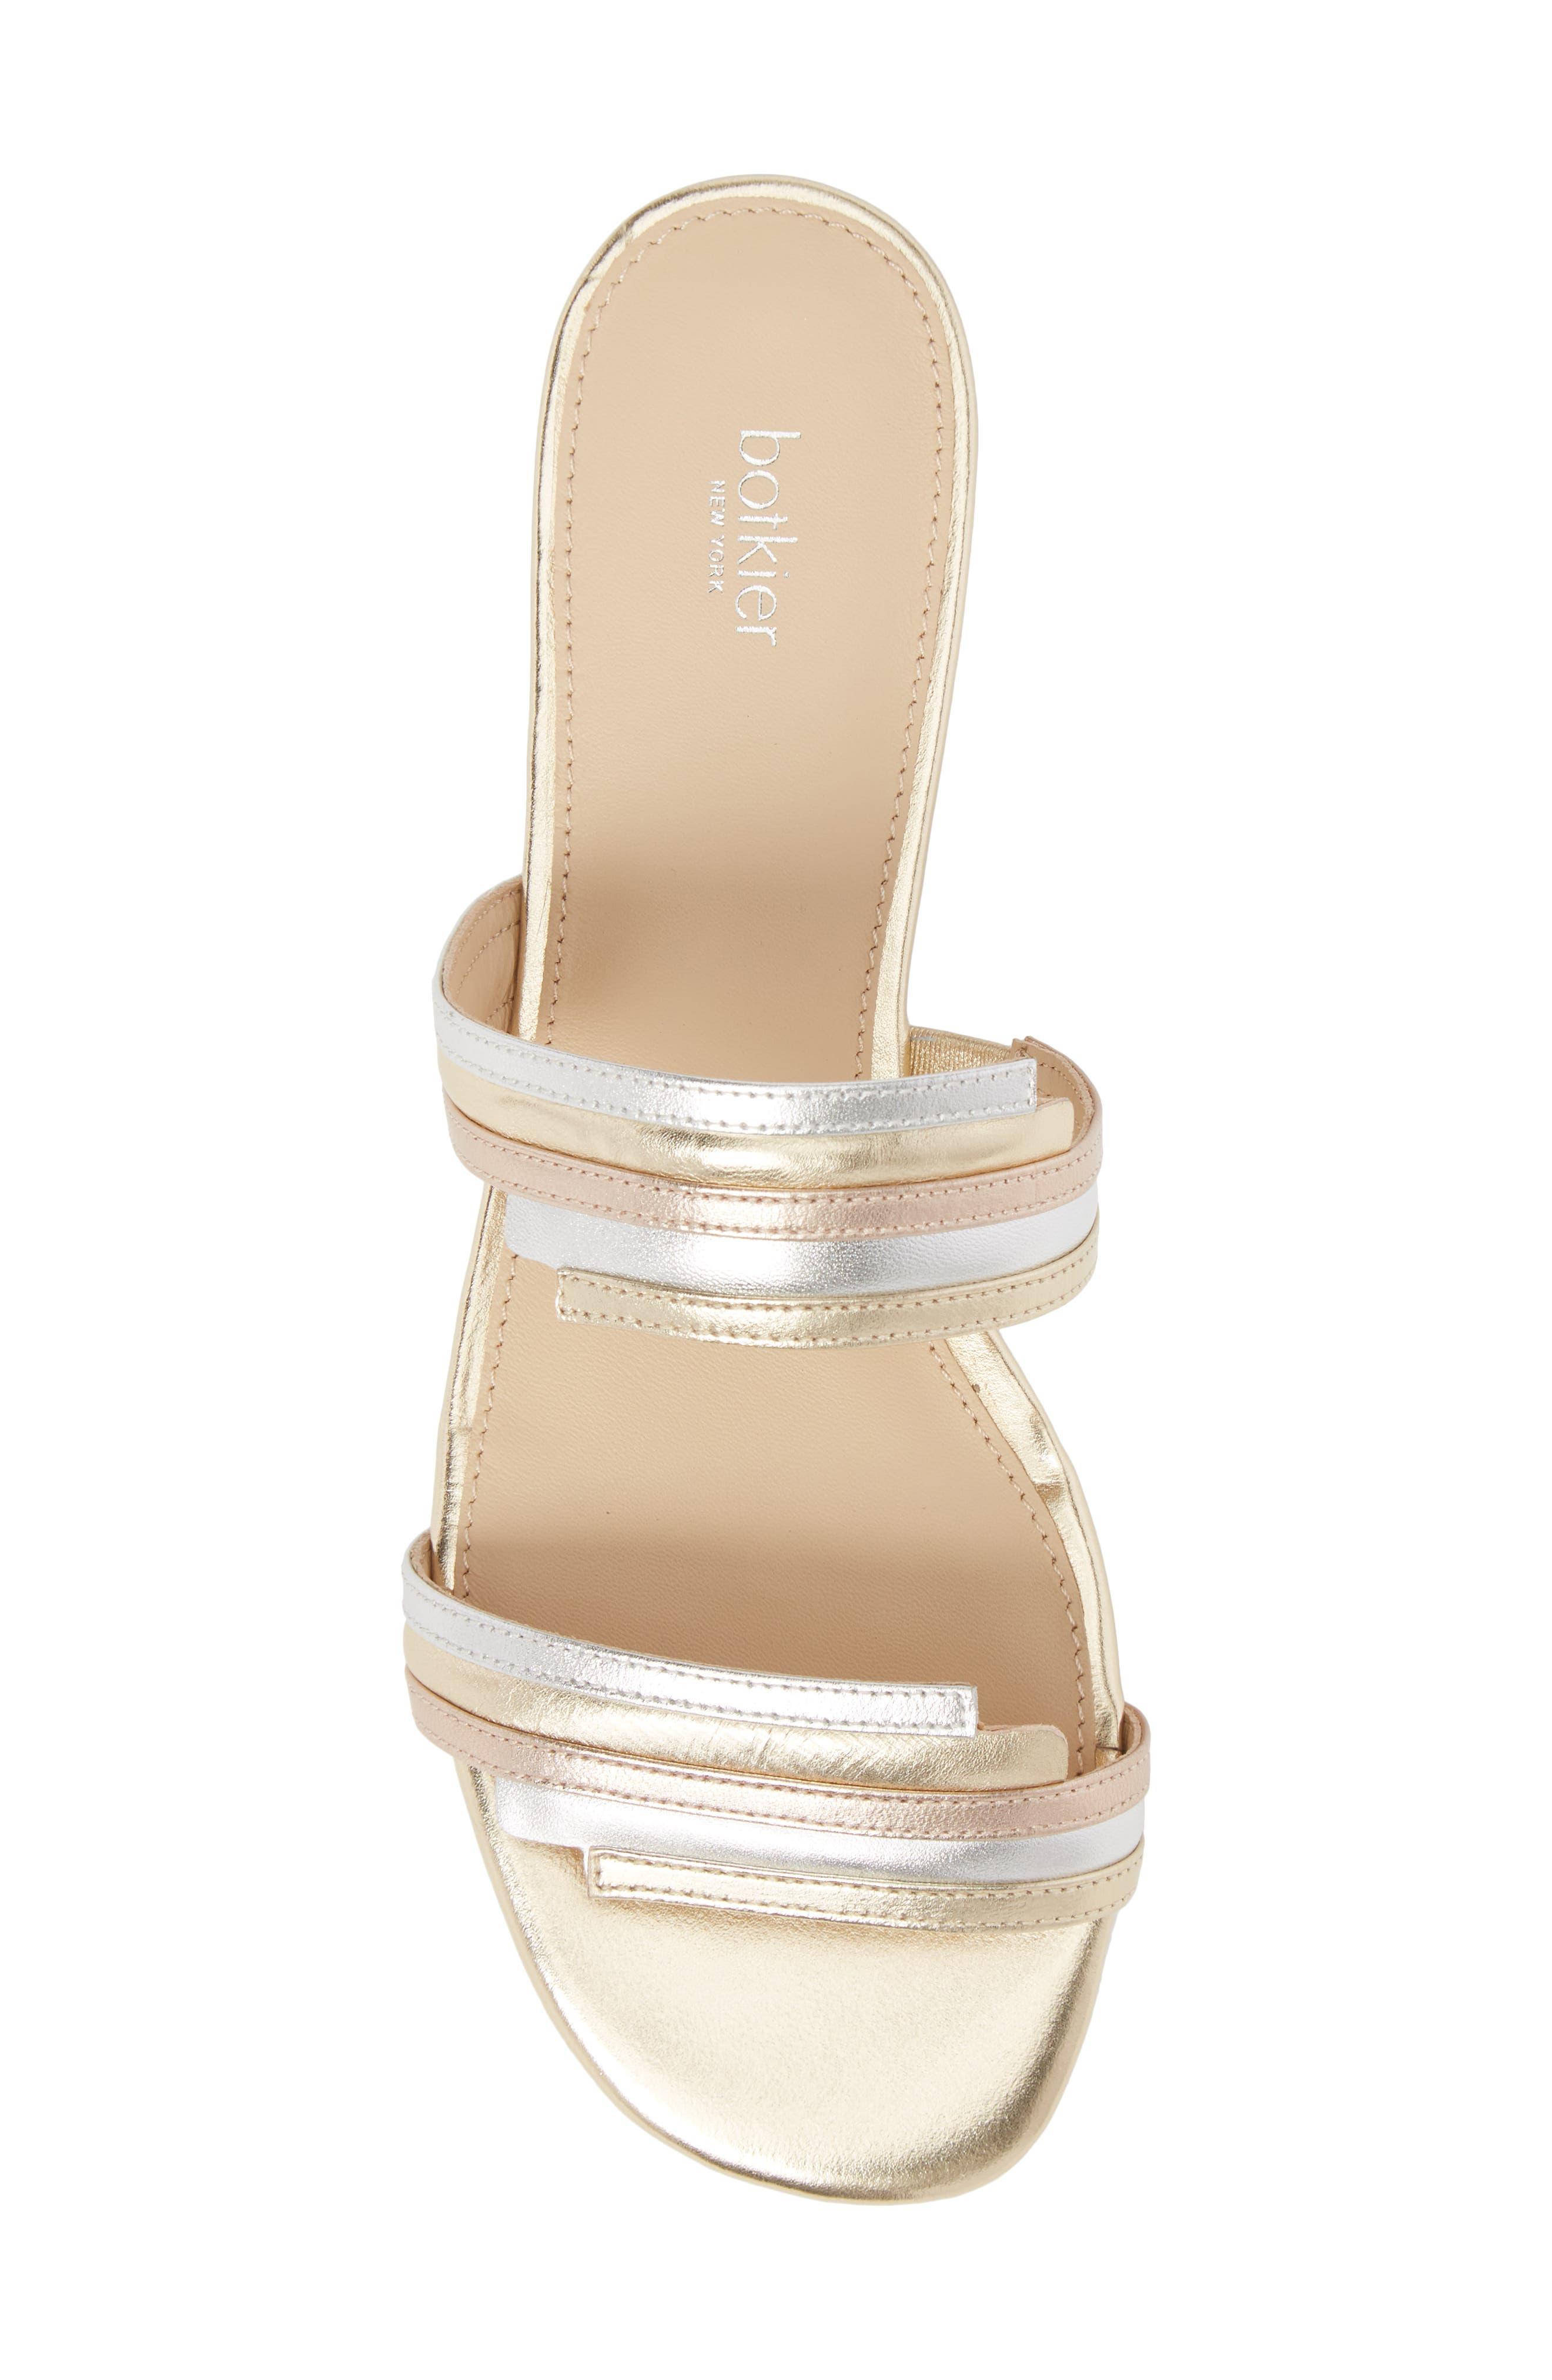 Maise Slide Sandal,                             Alternate thumbnail 5, color,                             Ivory Multi Leather